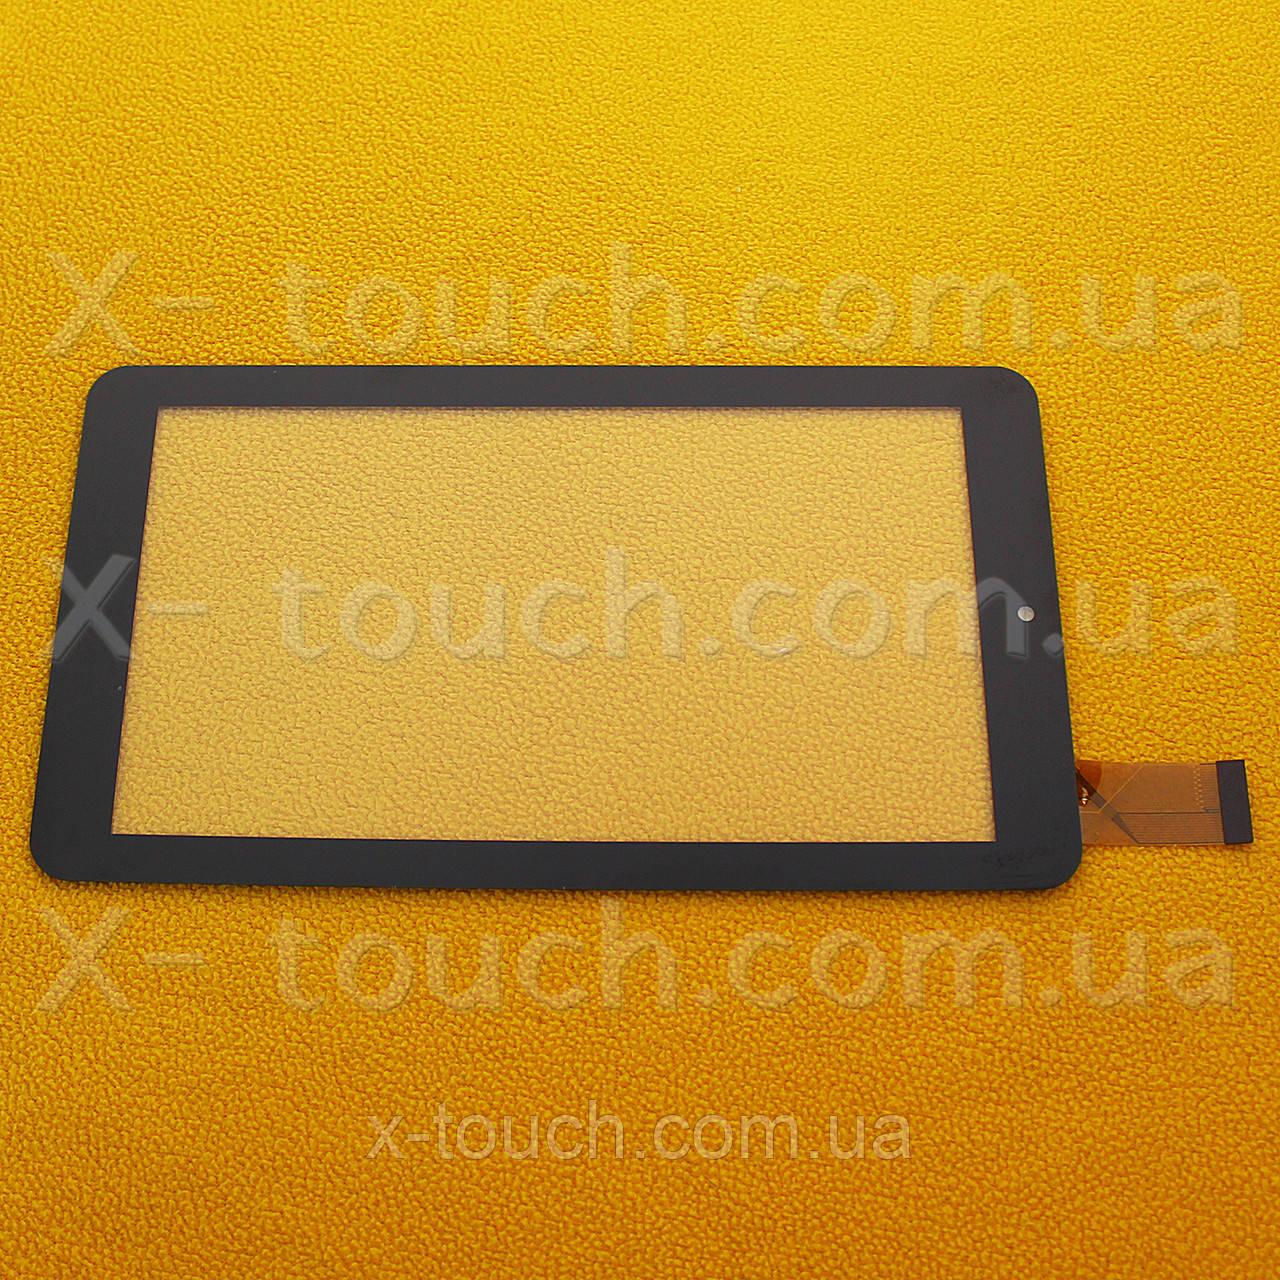 Тачскрин, сенсор  FM706701KE, KC  для планшета